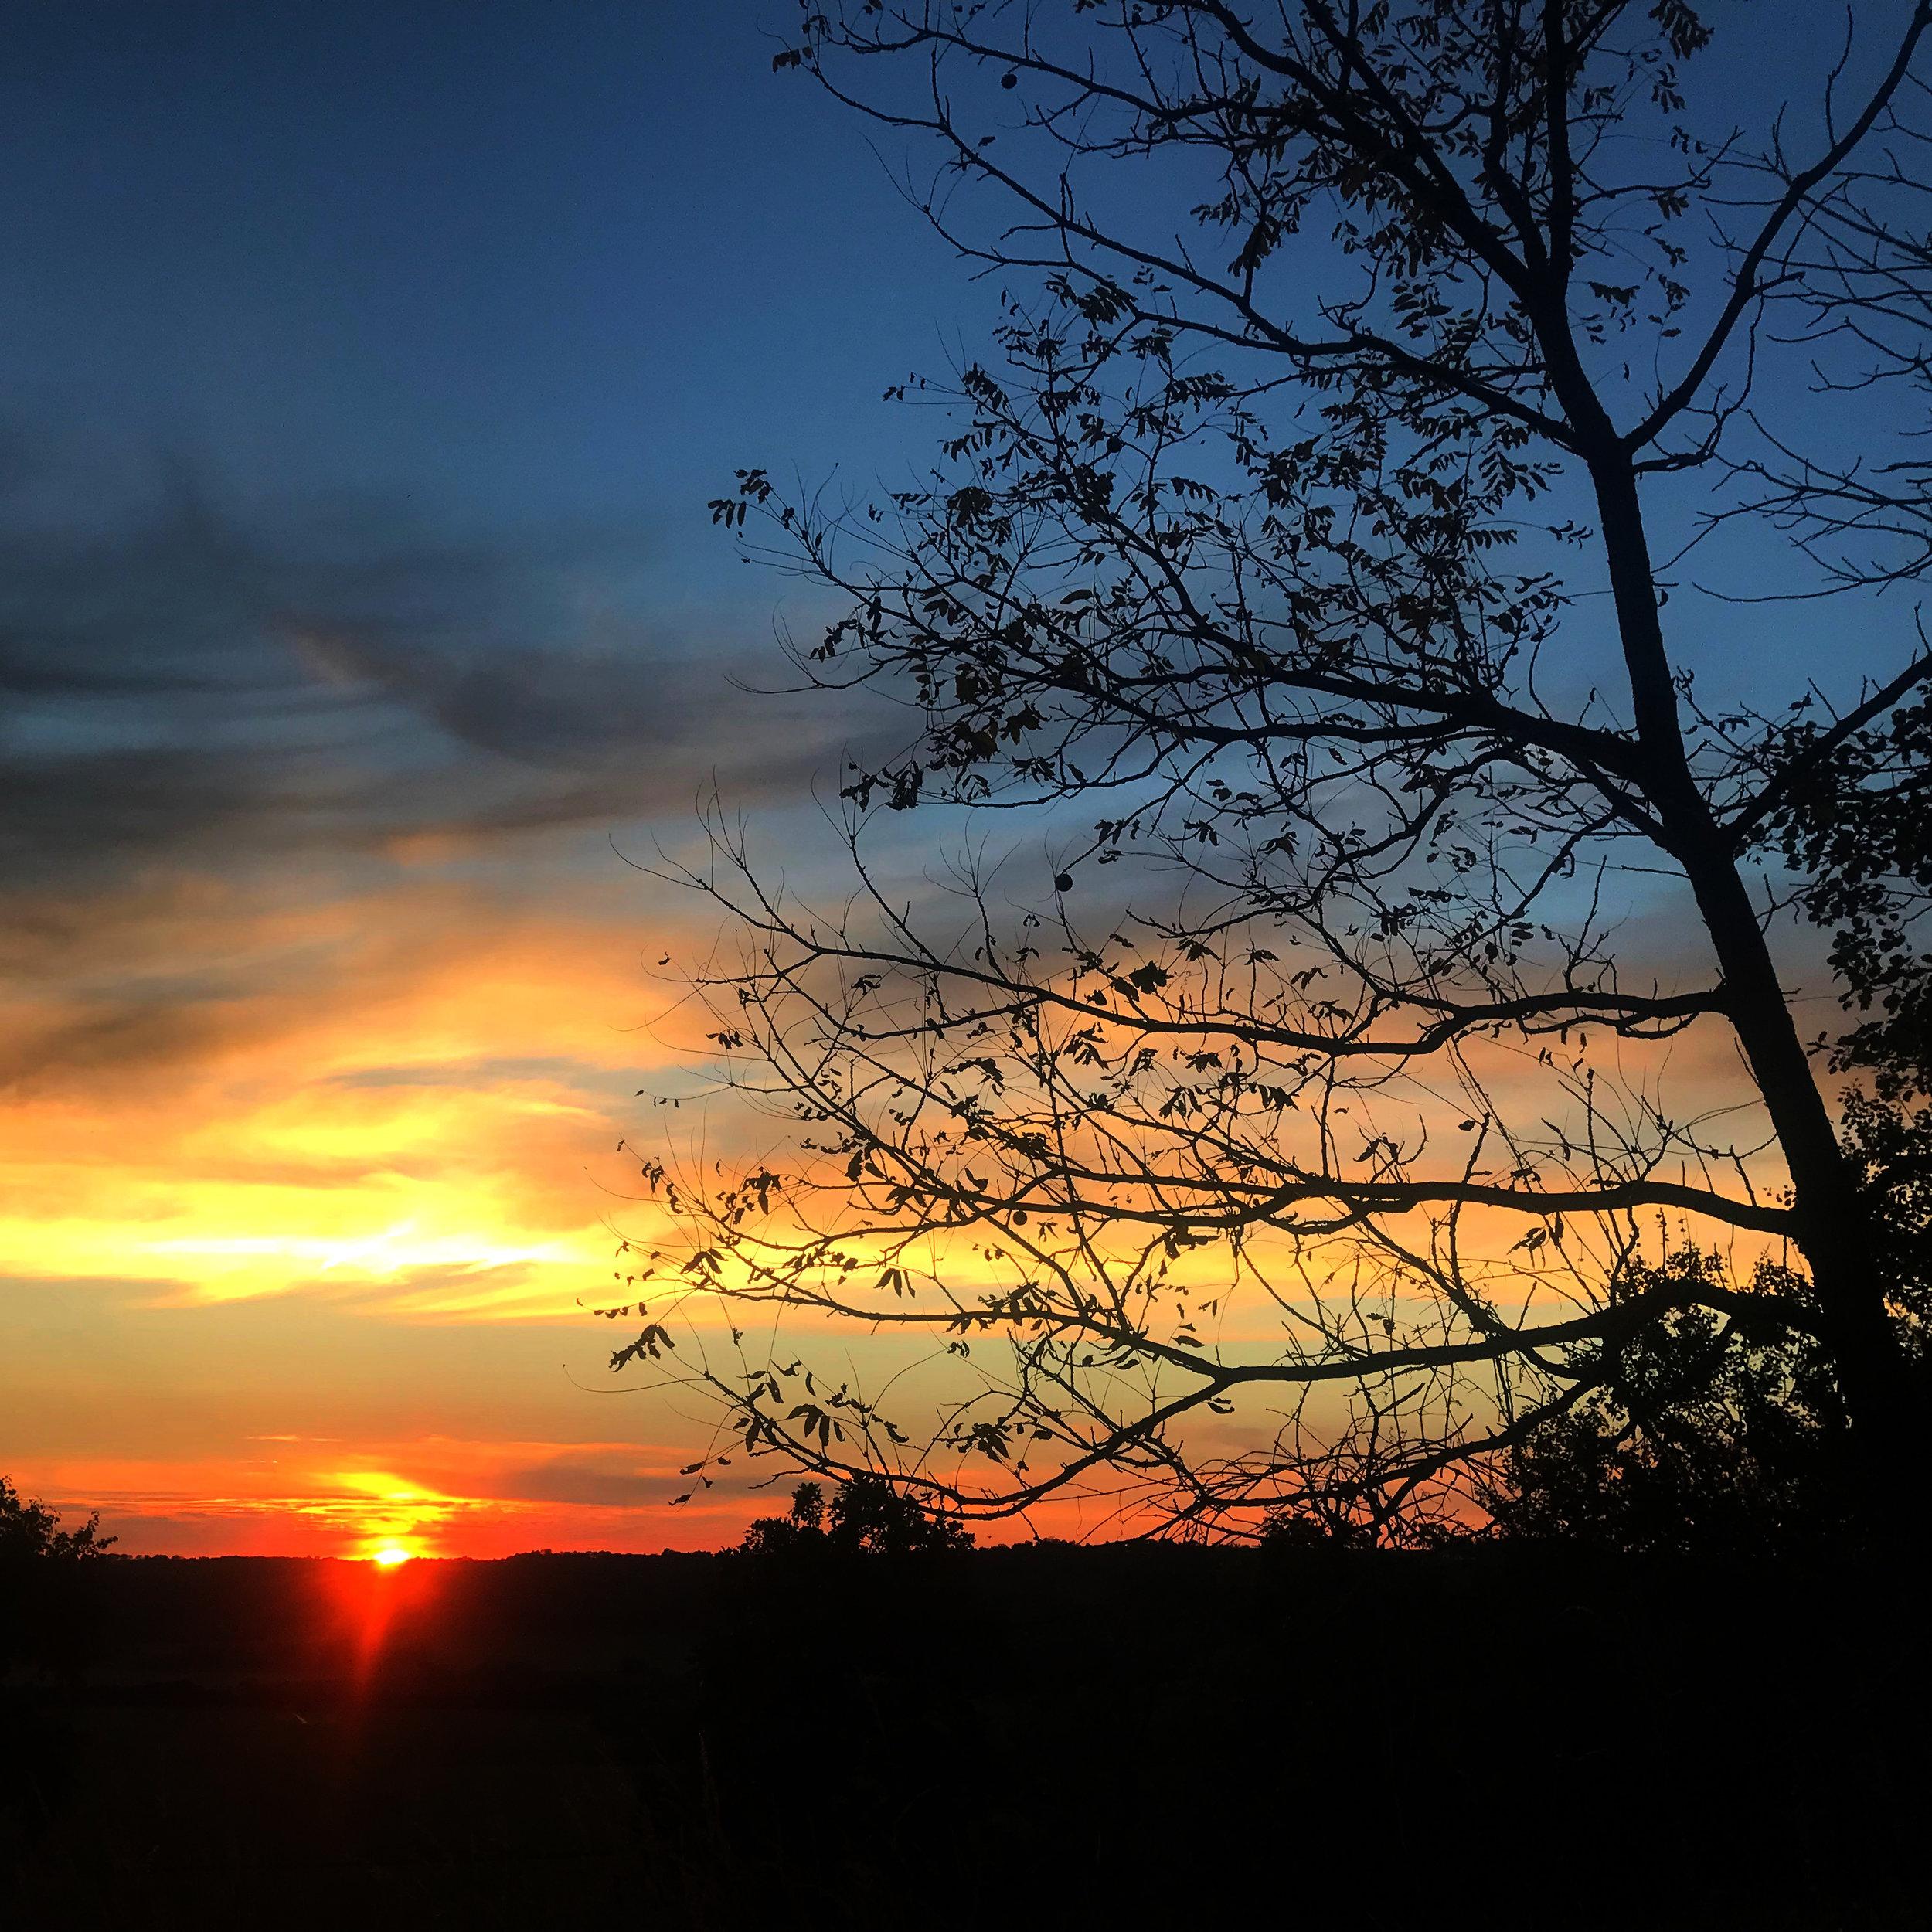 awi-outside-sunset-sq.jpg